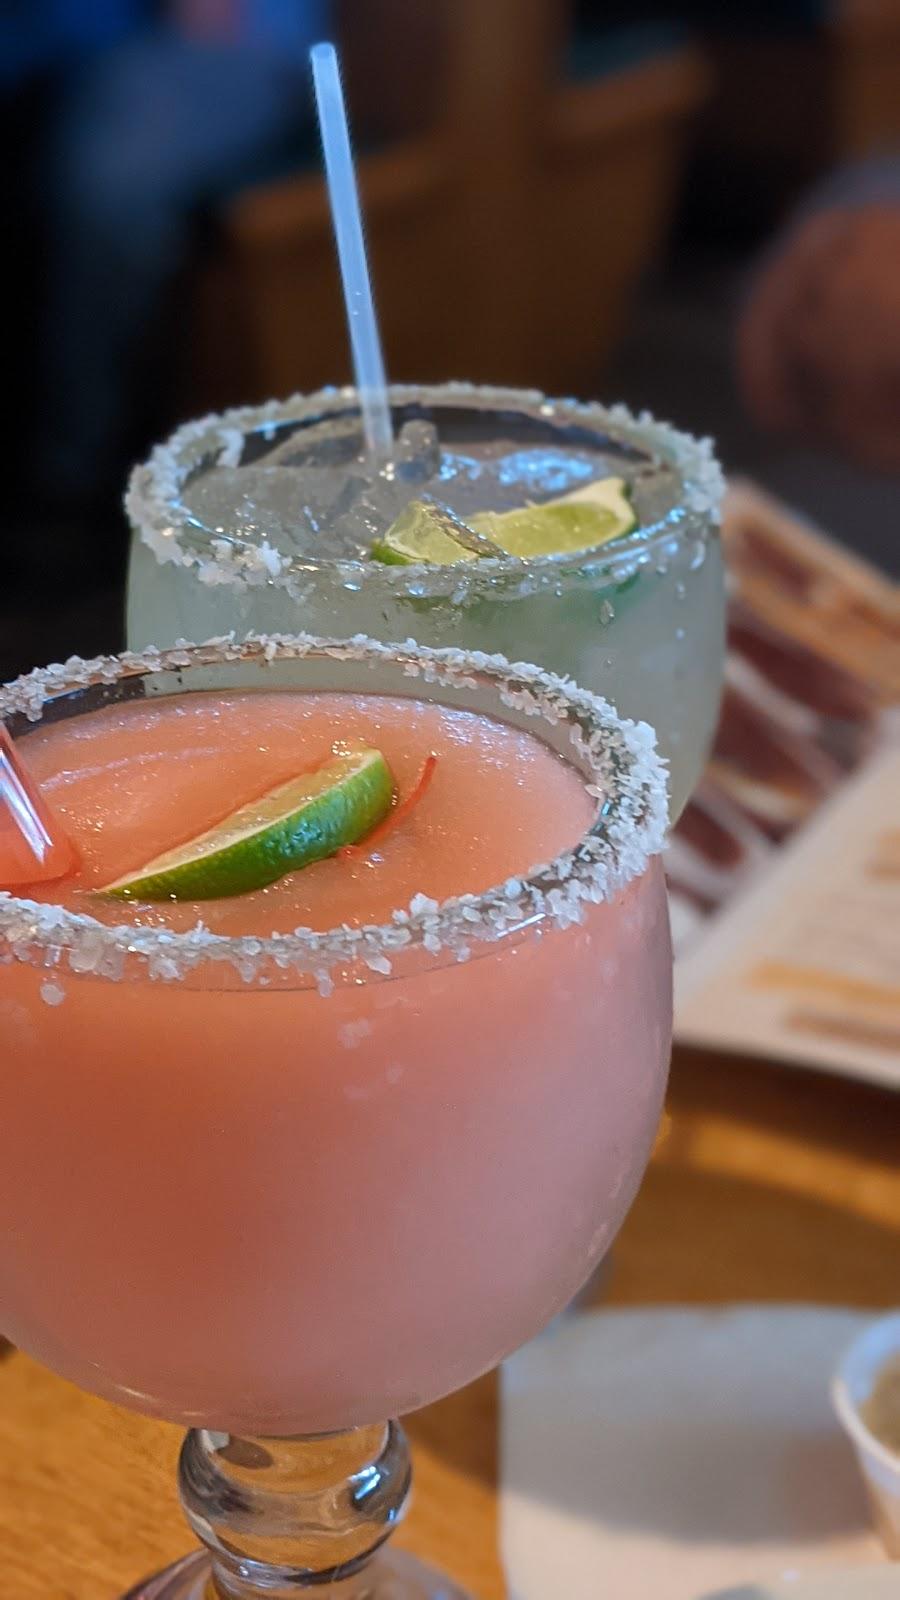 Texas Roadhouse - restaurant    Photo 7 of 10   Address: 8450 N Cracker Barrel Rd, Marana, AZ 85743, USA   Phone: (520) 579-3855